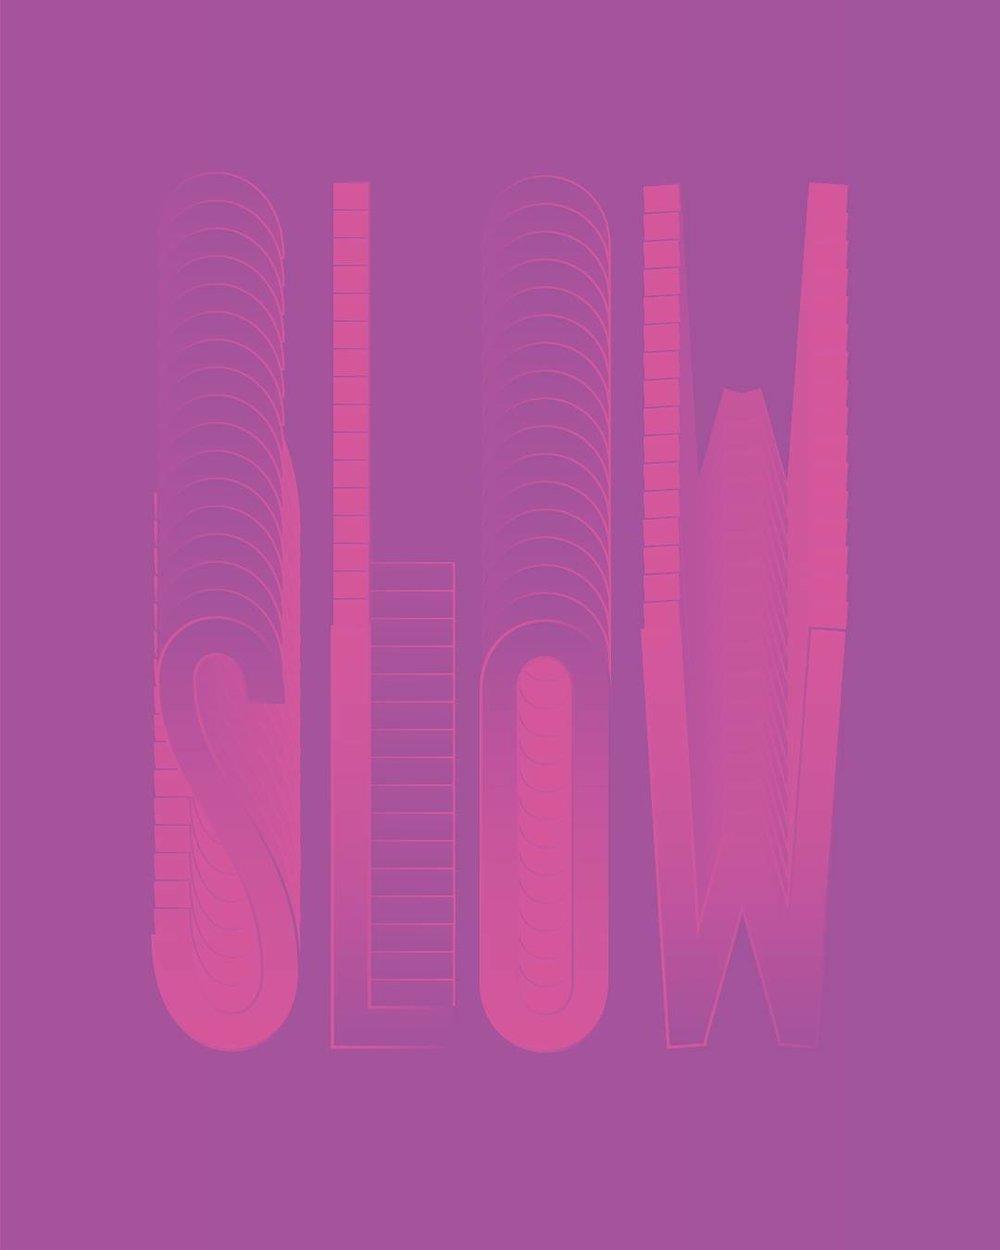 SLOW Lettering | Annie Szafranski | Feels Design Studio